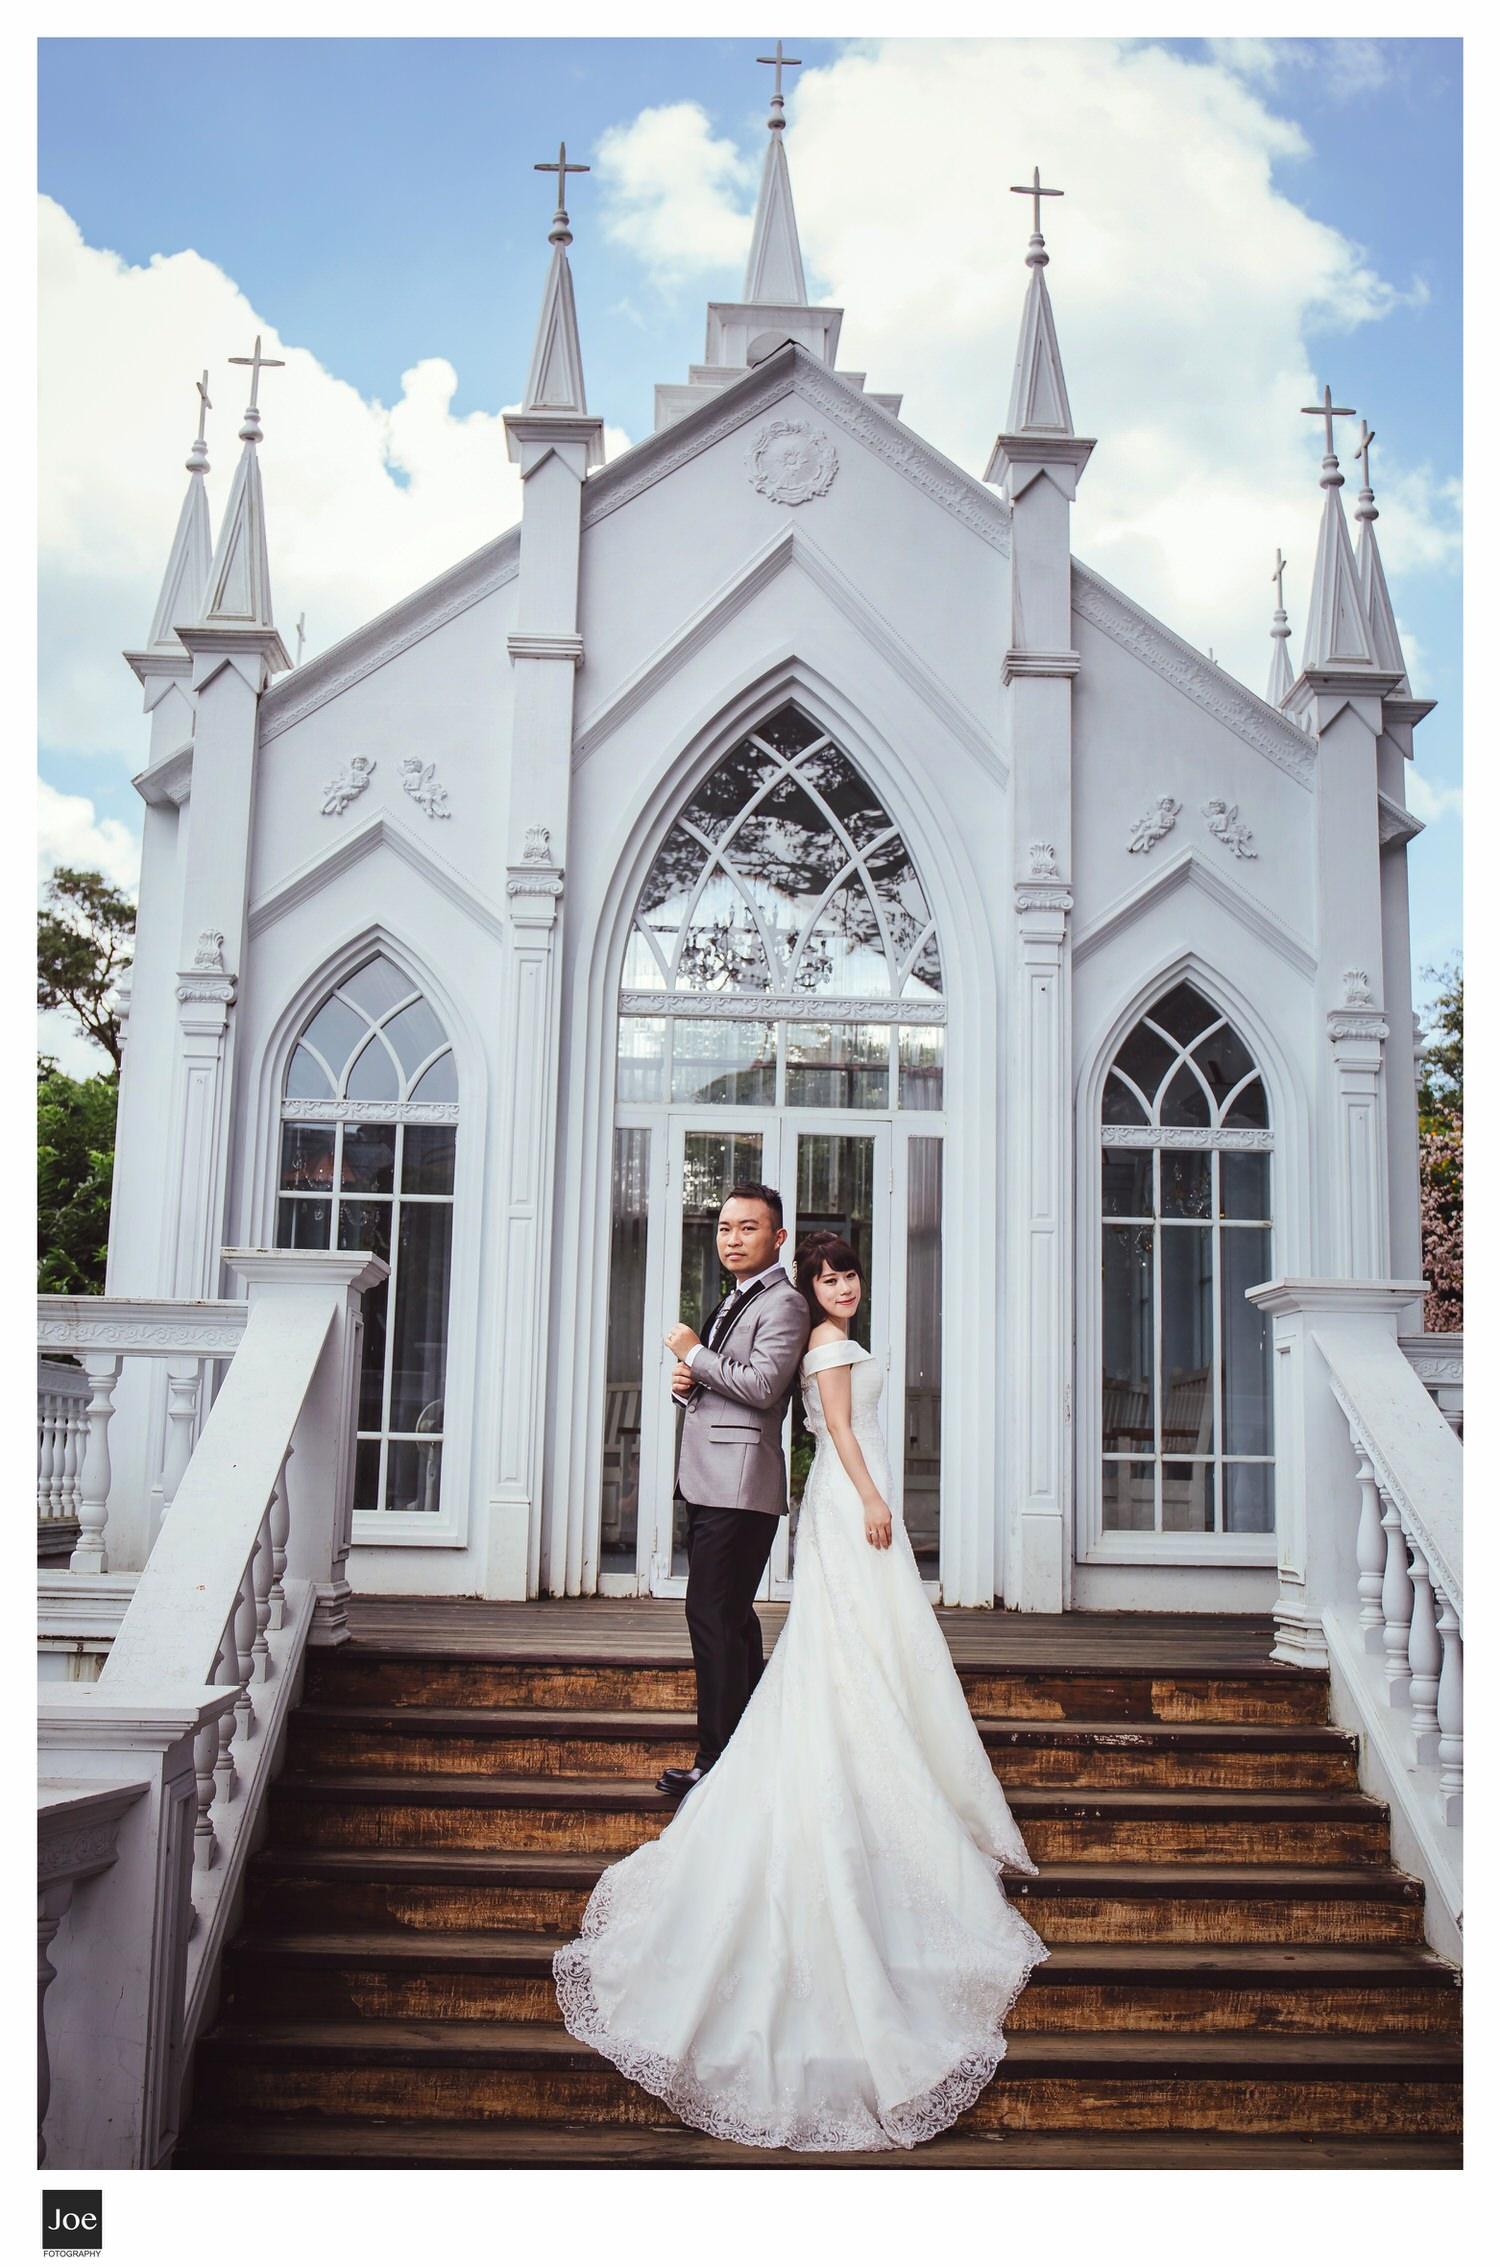 taiwan-pre-wedding-roger-wing-joe-fotography-018.jpg